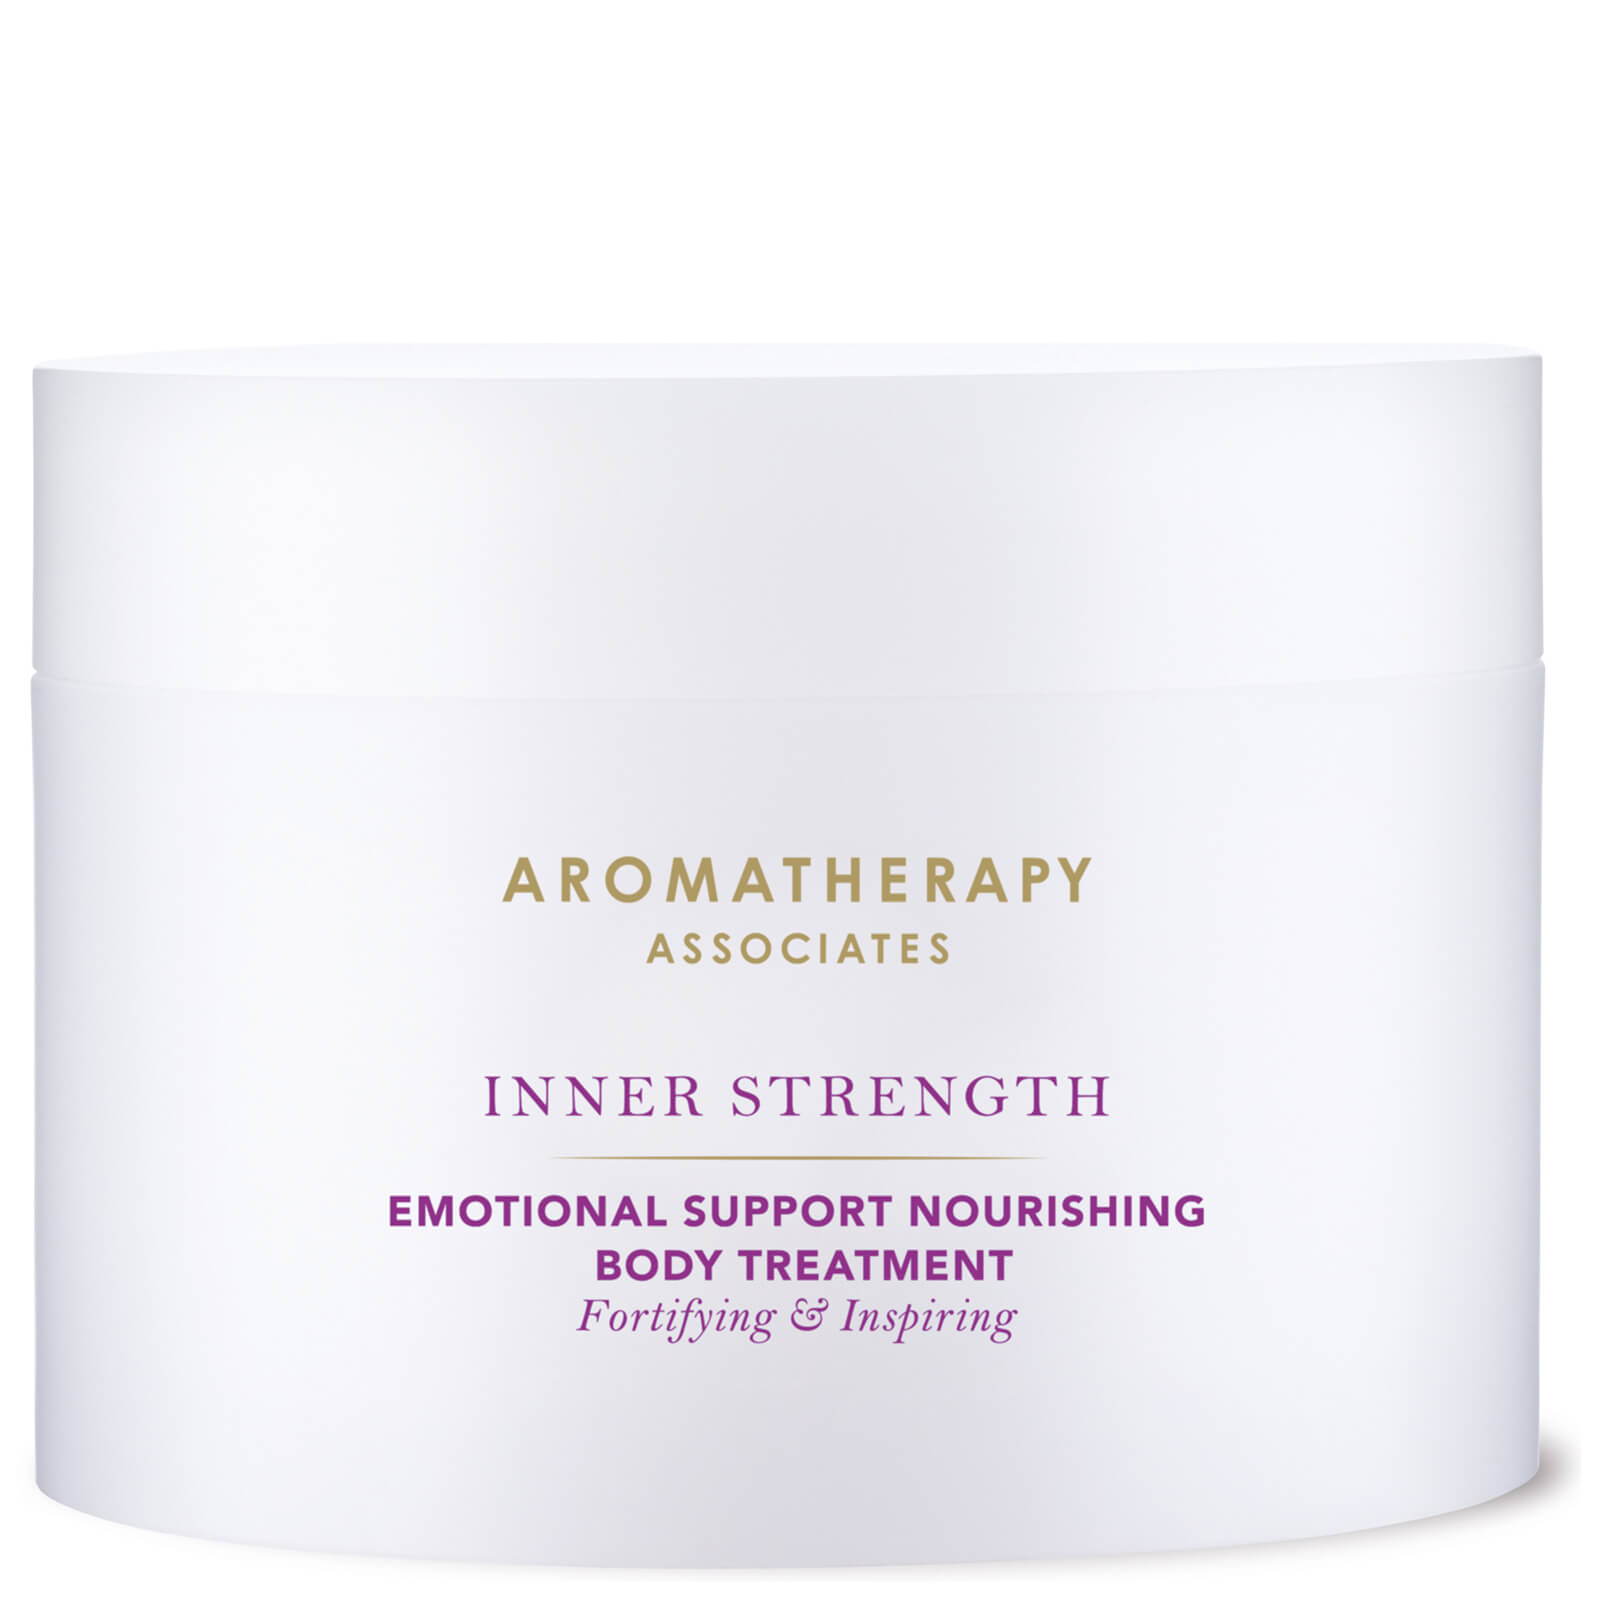 Купить Aromatherapy Associates Inner Strength Body Treatment 200ml